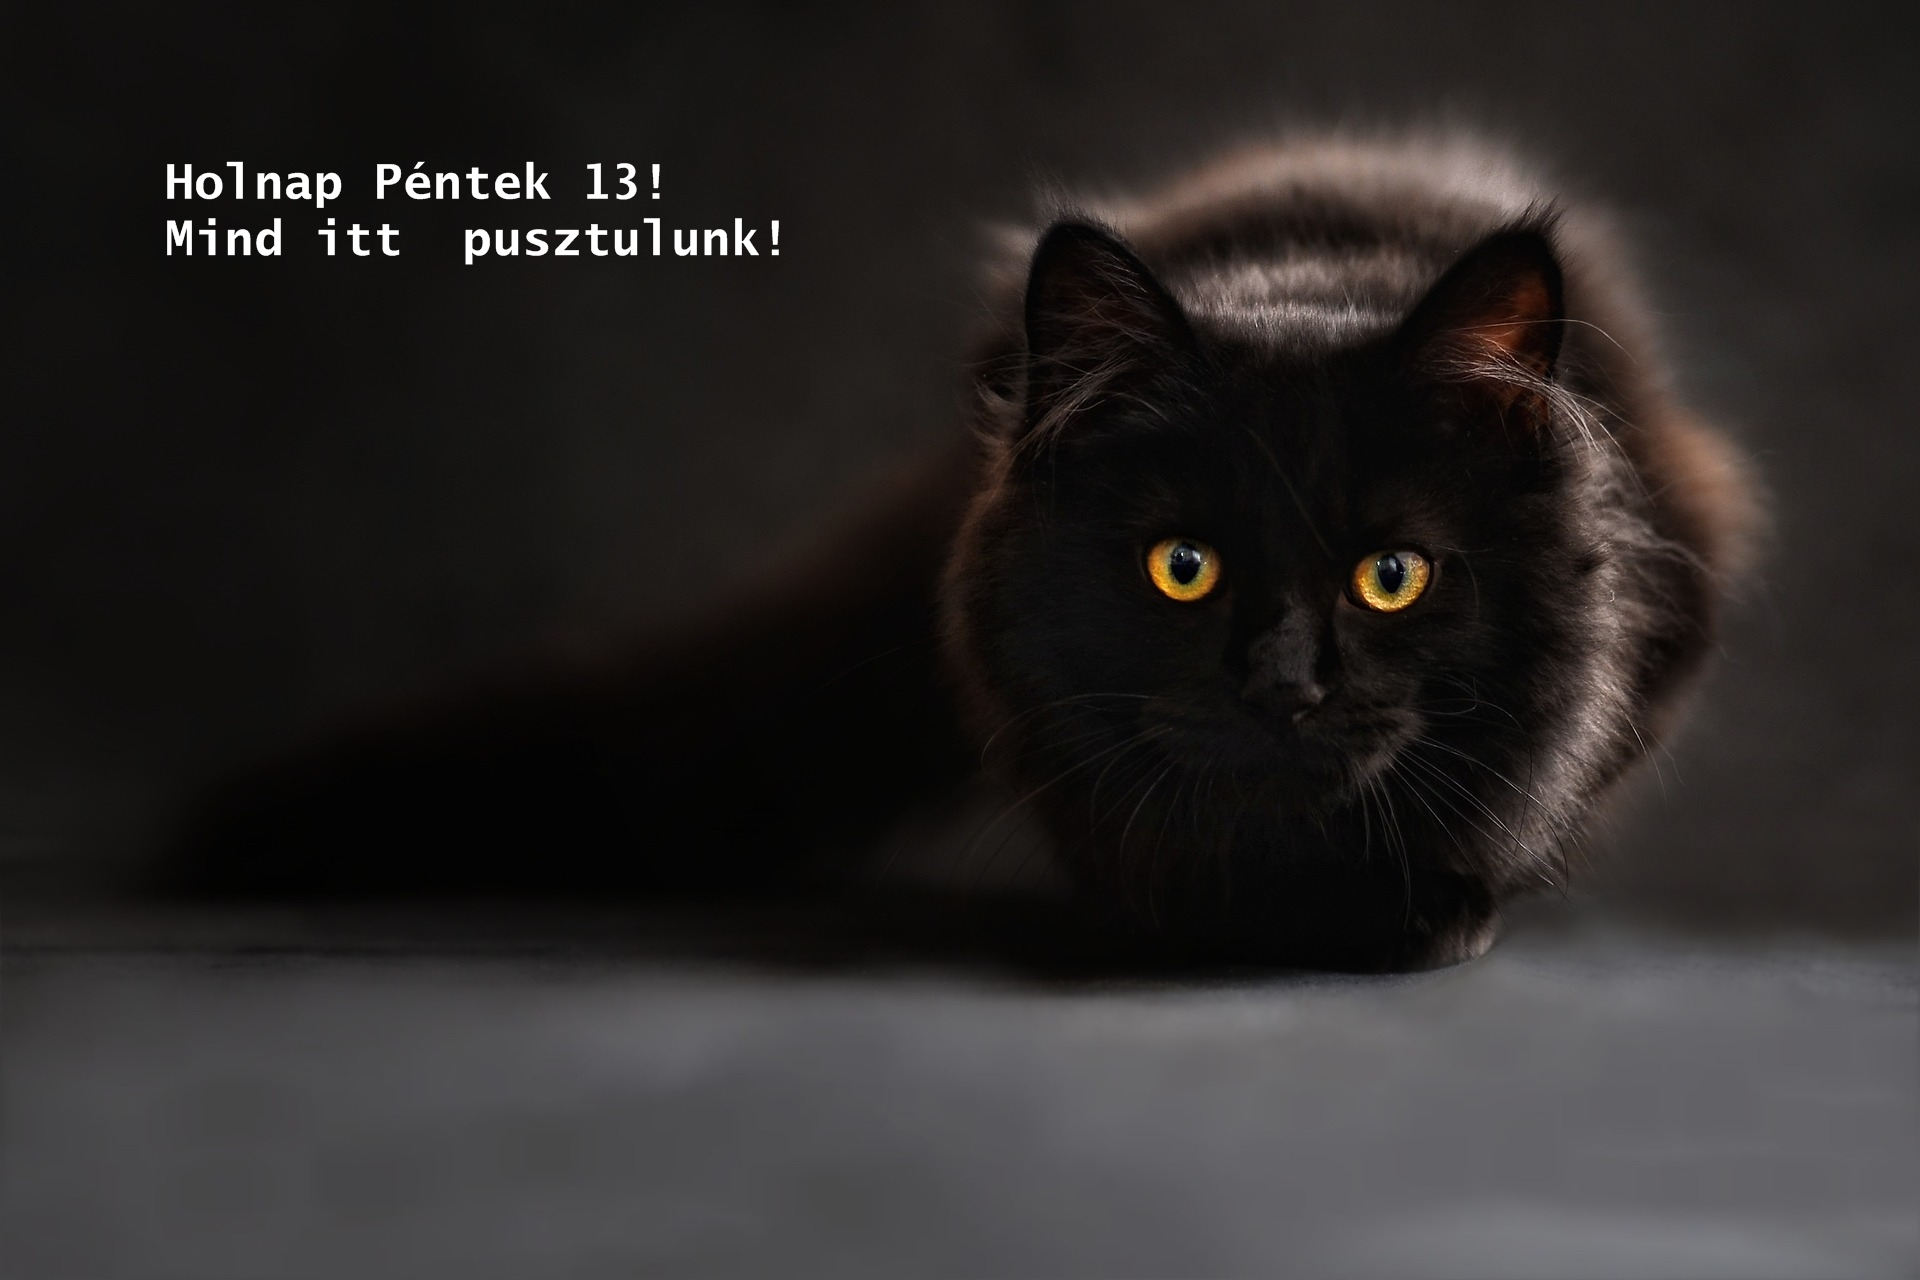 http://kepmester.silihost.hu/images/1703/10978/00000425.jpg